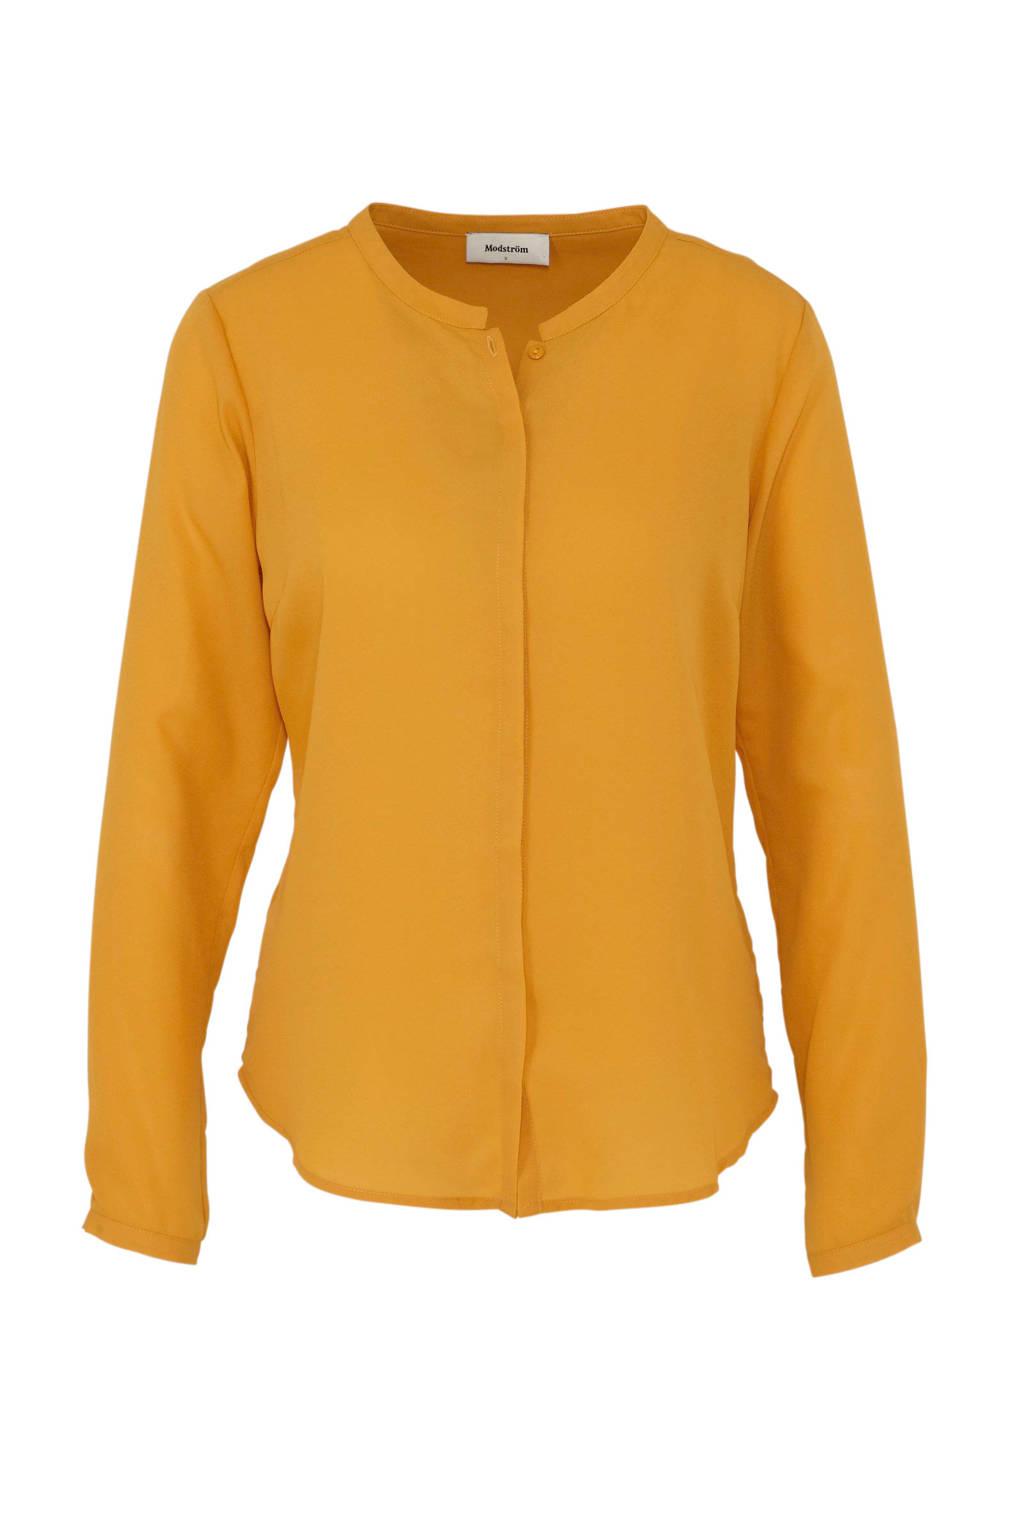 Modström blouse Cyler geel, Geel